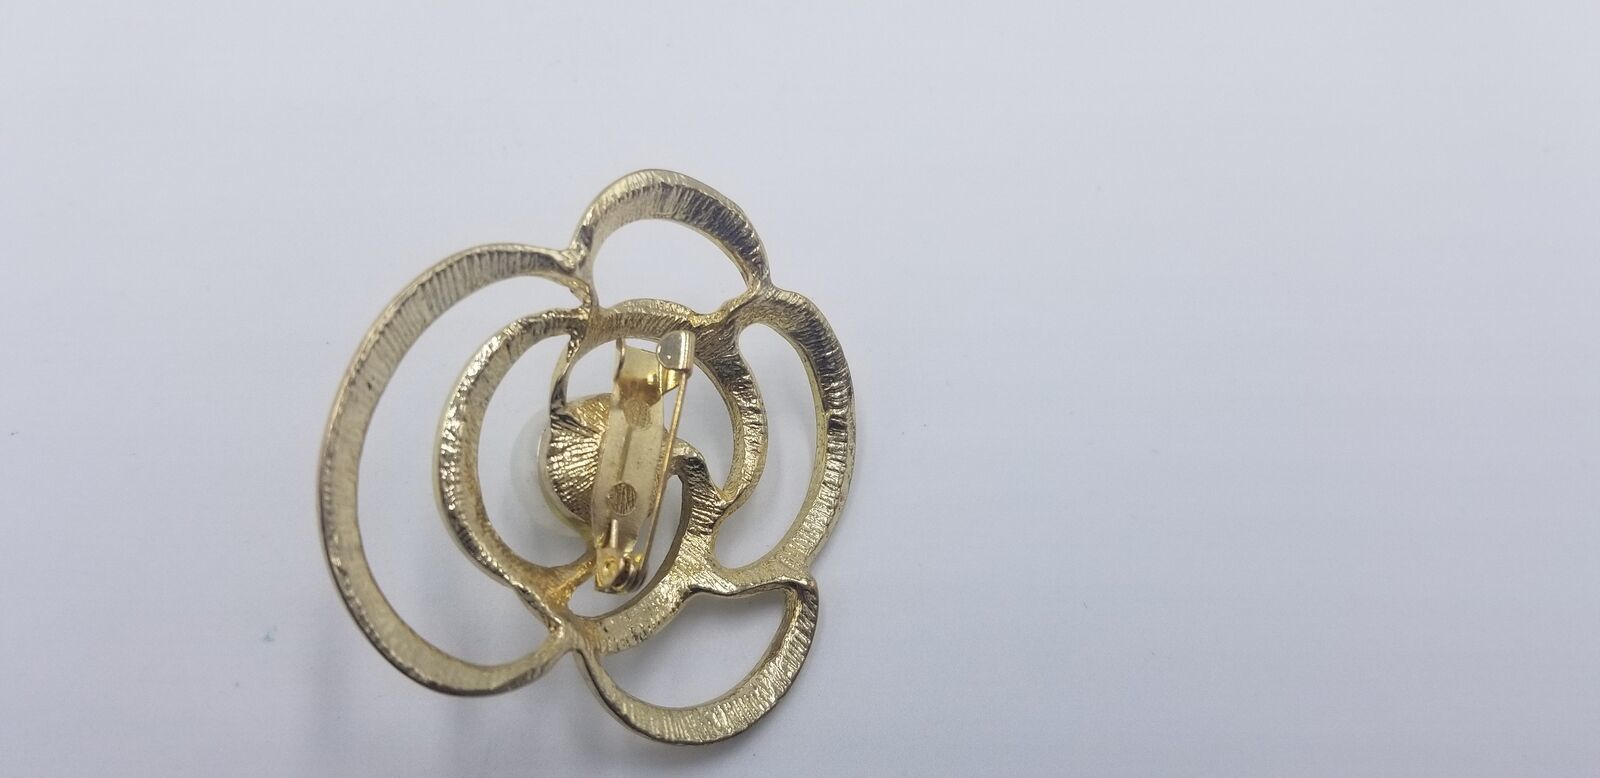 Vintage Abstract Circular Pin / Brooch W/ Multi Rhinestones & Big Middle Pearl